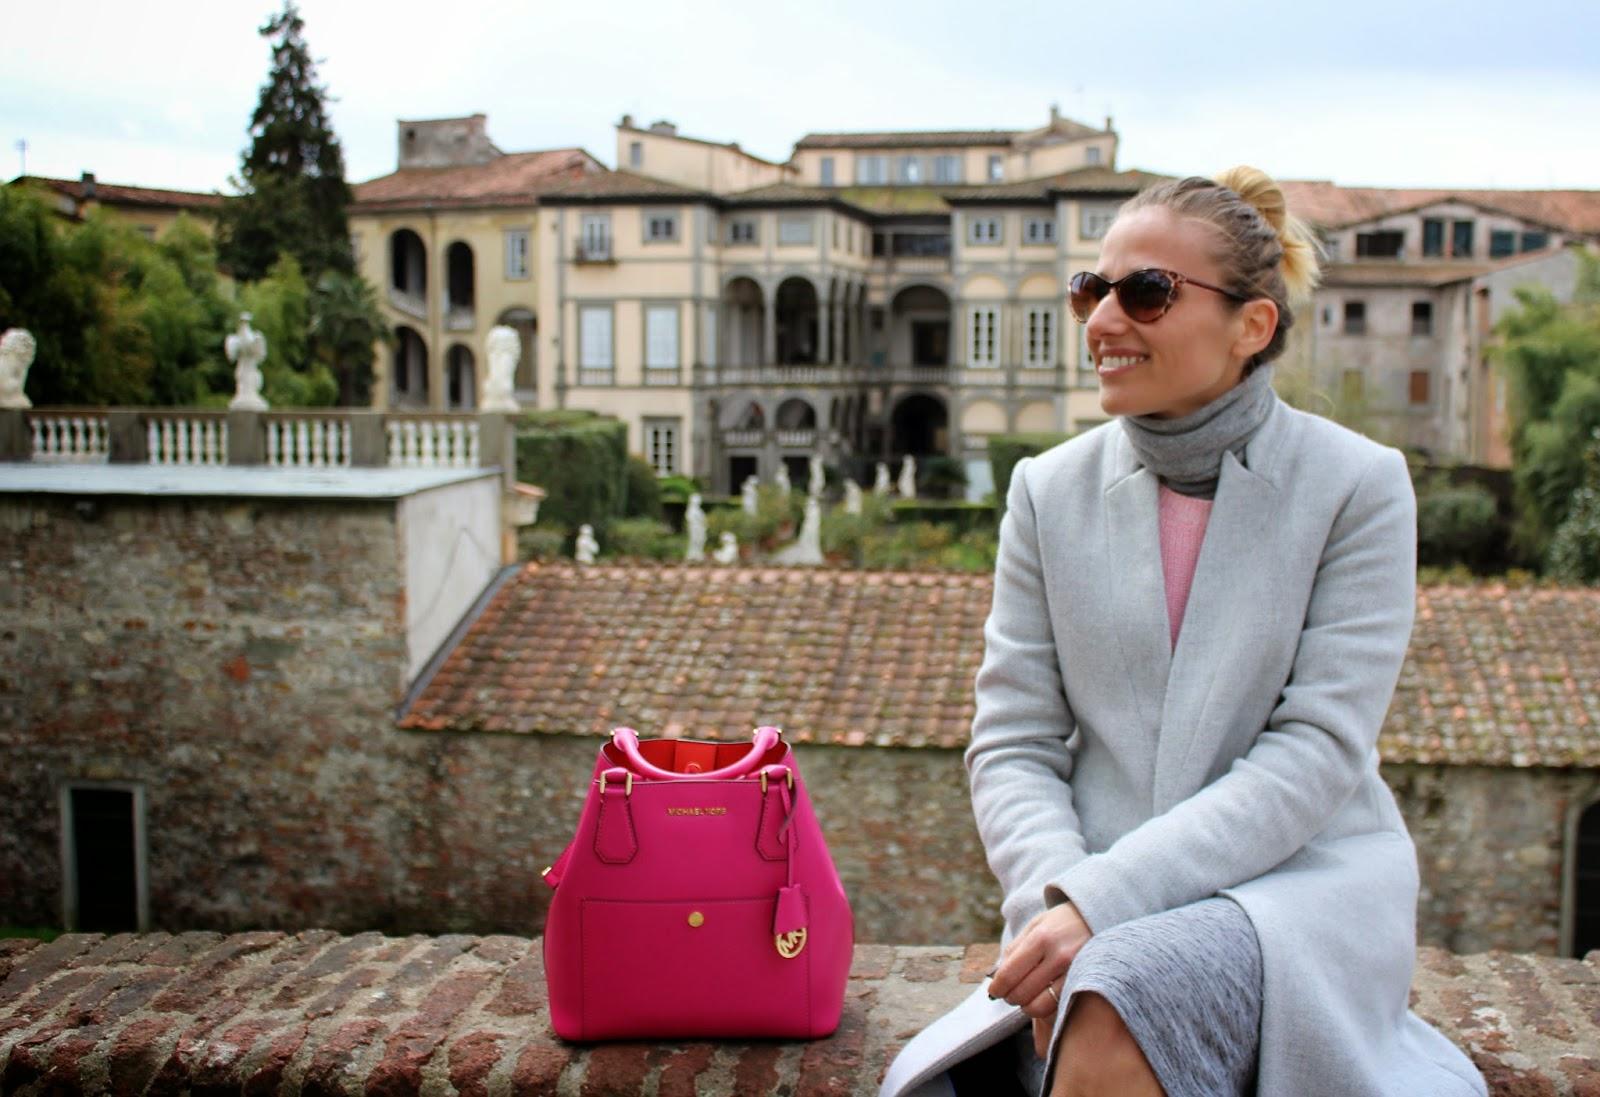 Eniwhere Fashion - Lucca - Stan Smith e Michael Kors